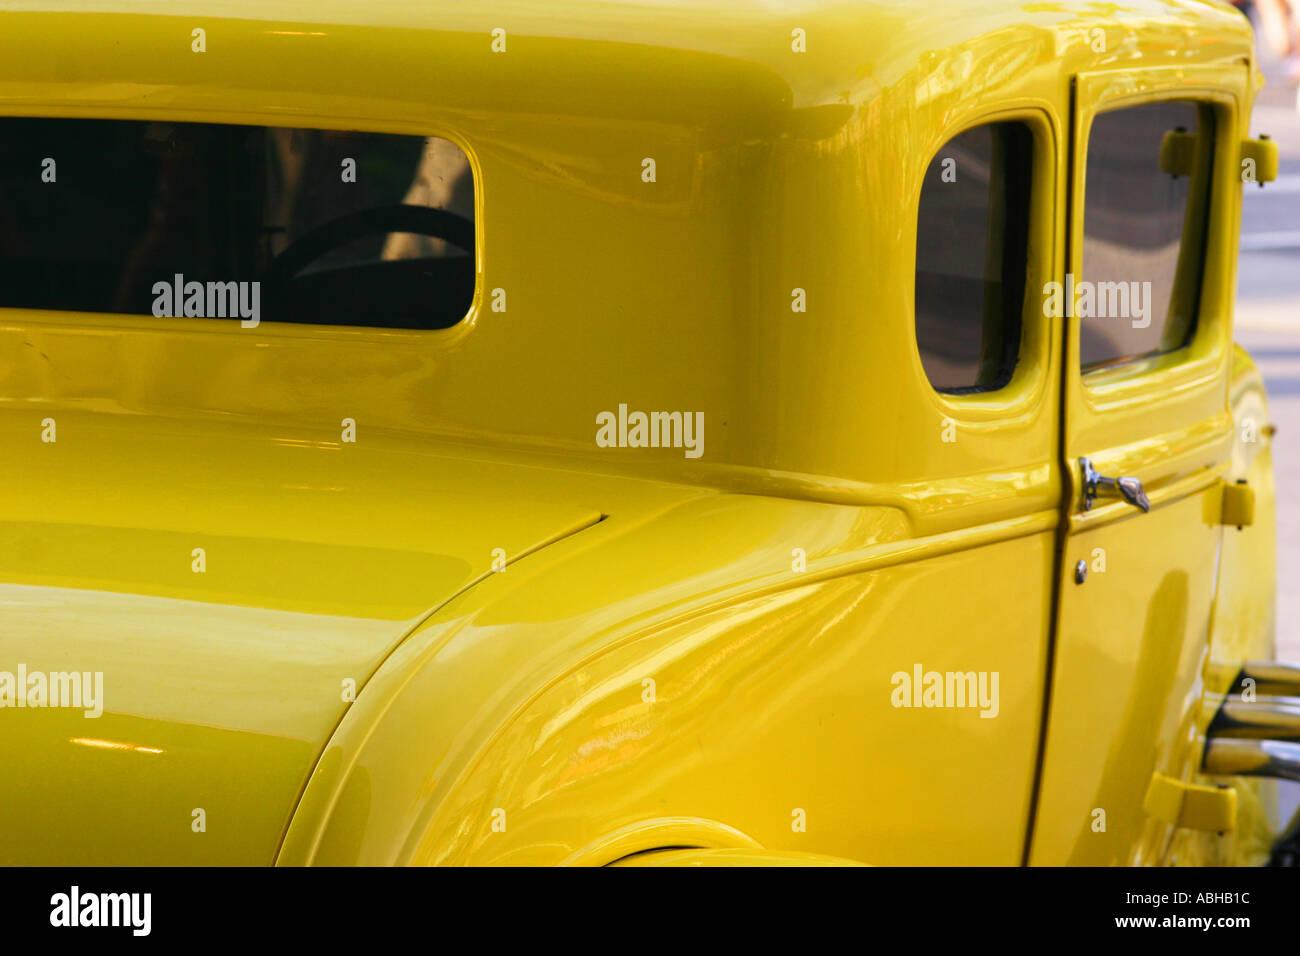 jeep design stockfotos jeep design bilder alamy. Black Bedroom Furniture Sets. Home Design Ideas